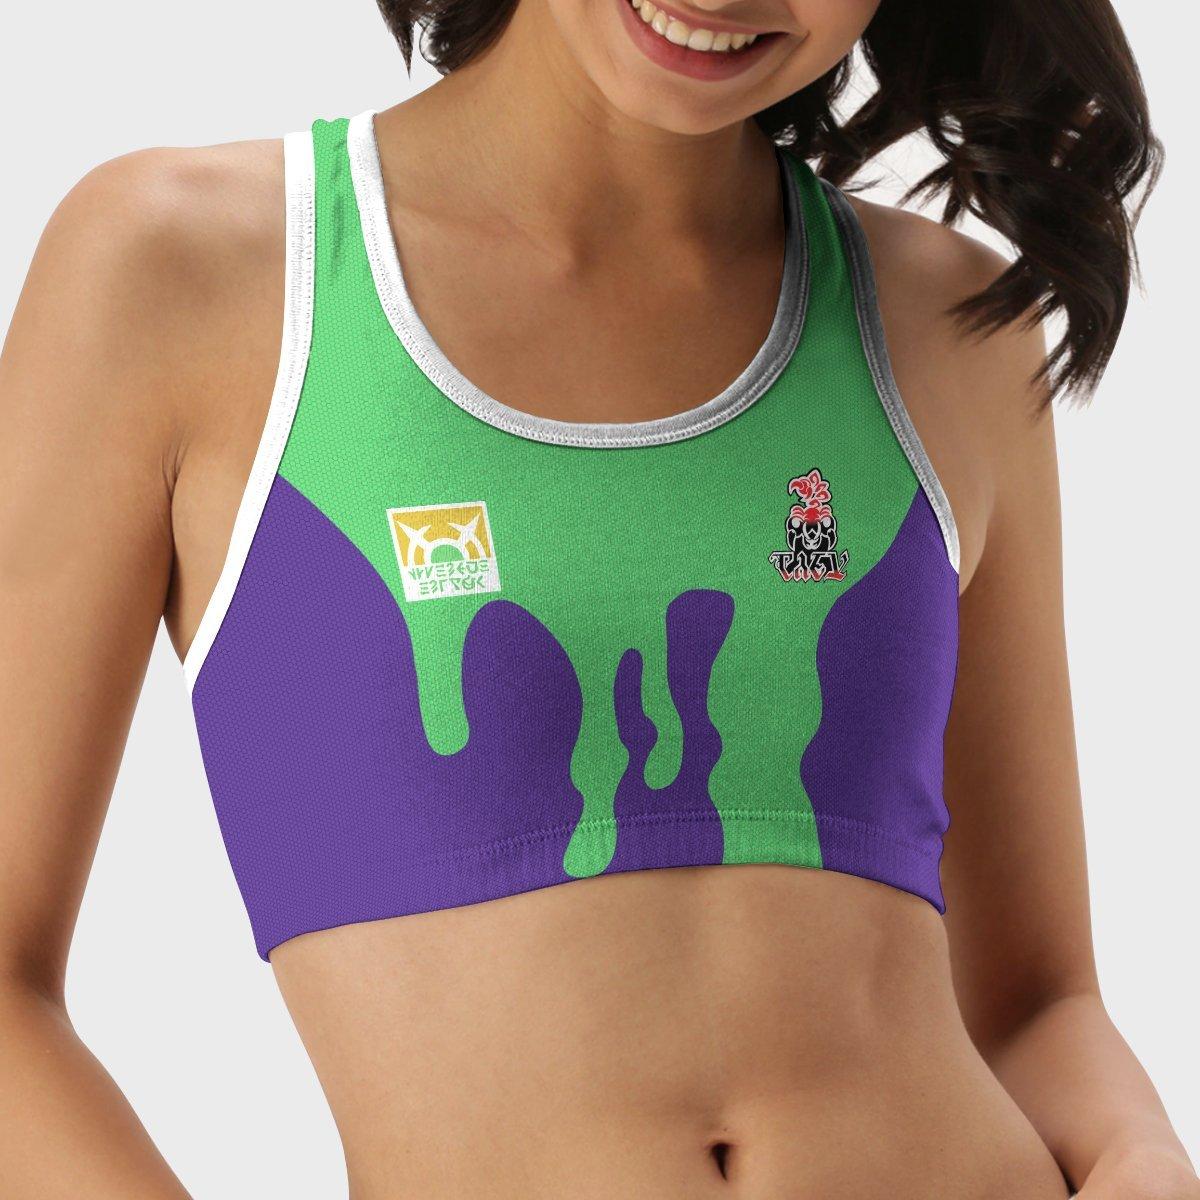 pokemon poison uniform active wear set 537351 - Anime Swimsuits